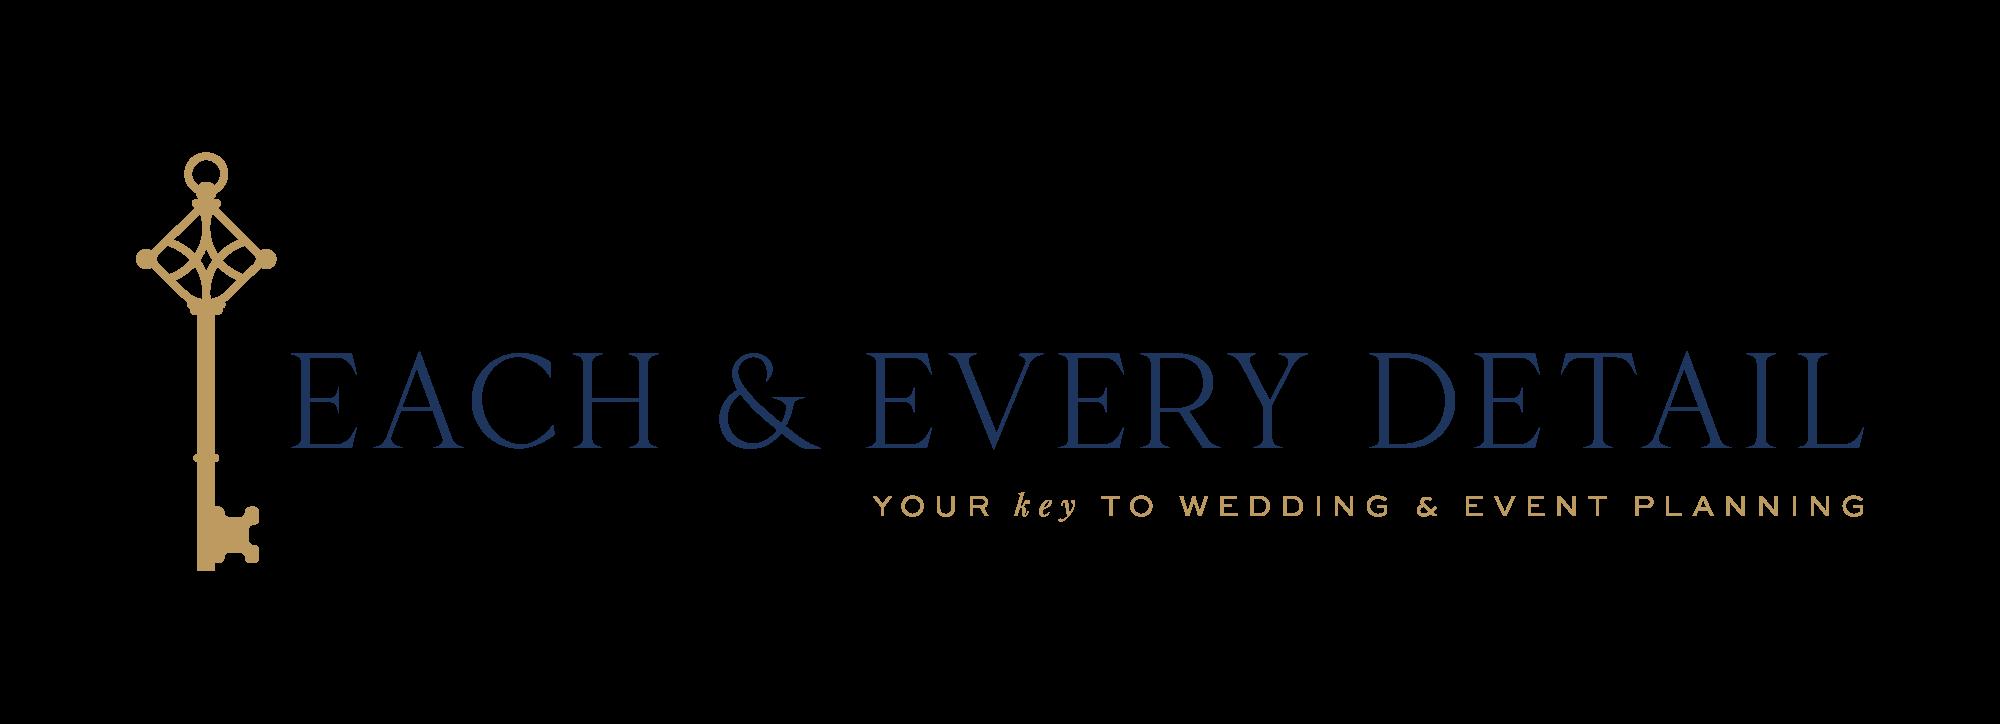 Each & Every Detail Logo